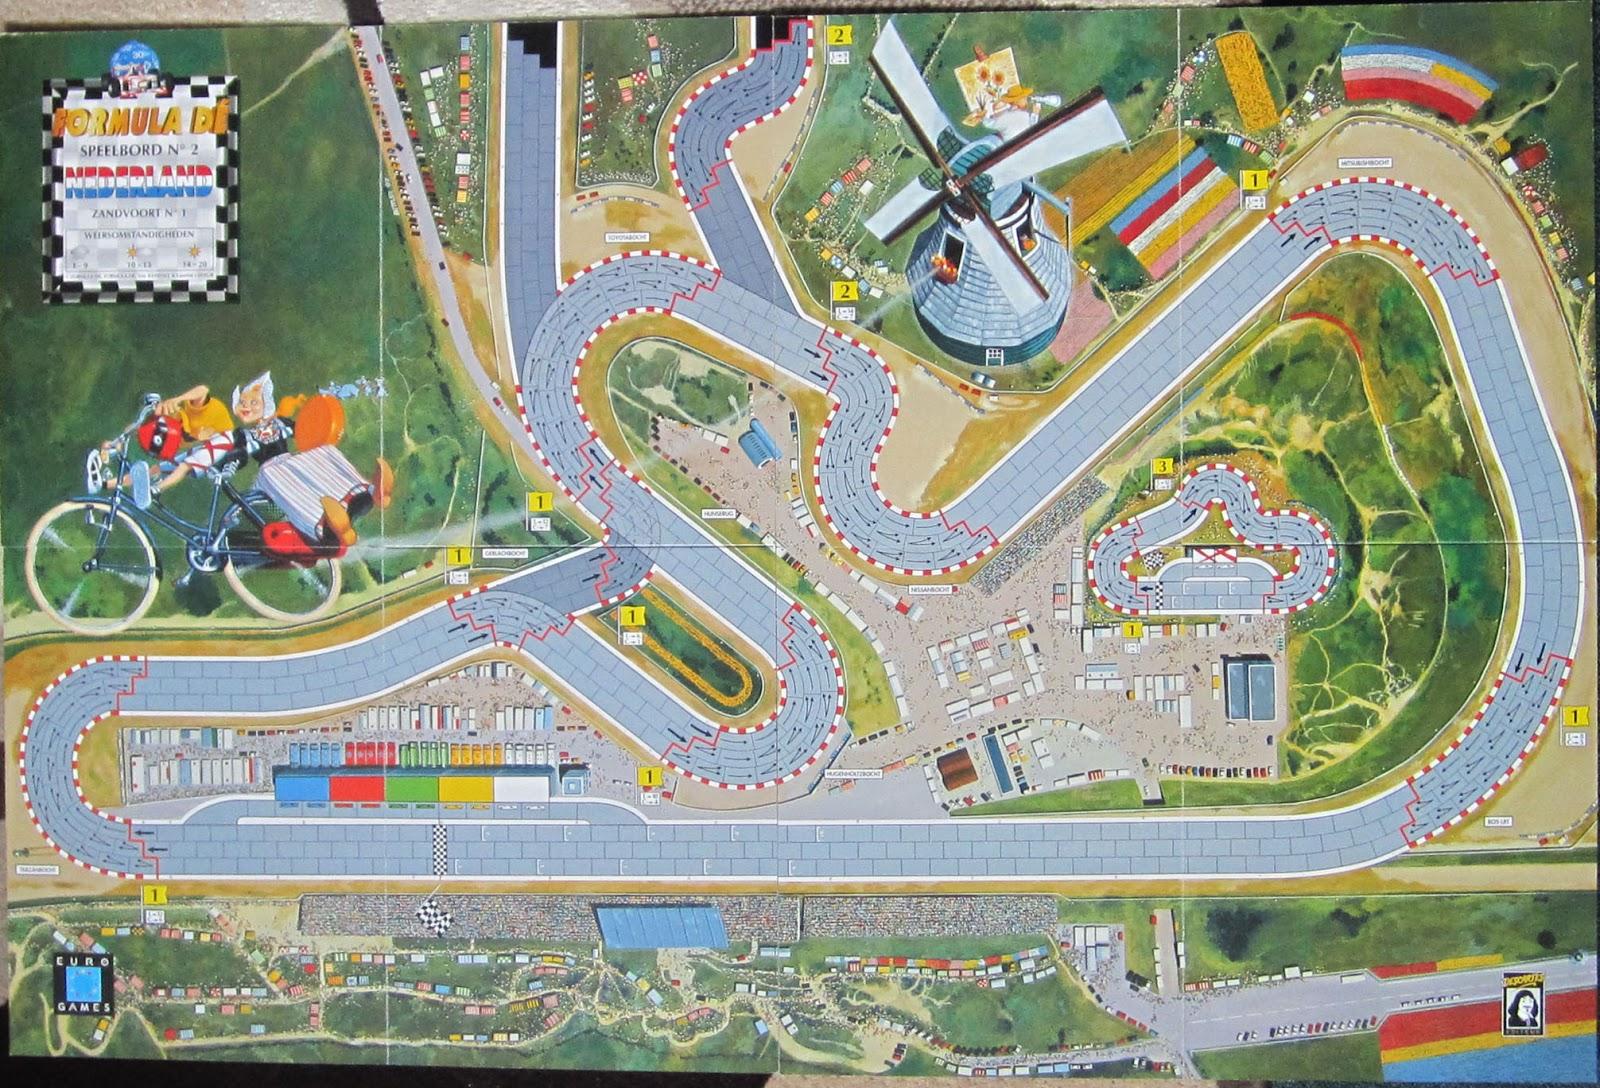 Formule Dé : Circuit N°1 & 2 - Monaco / Zandvoordt 1